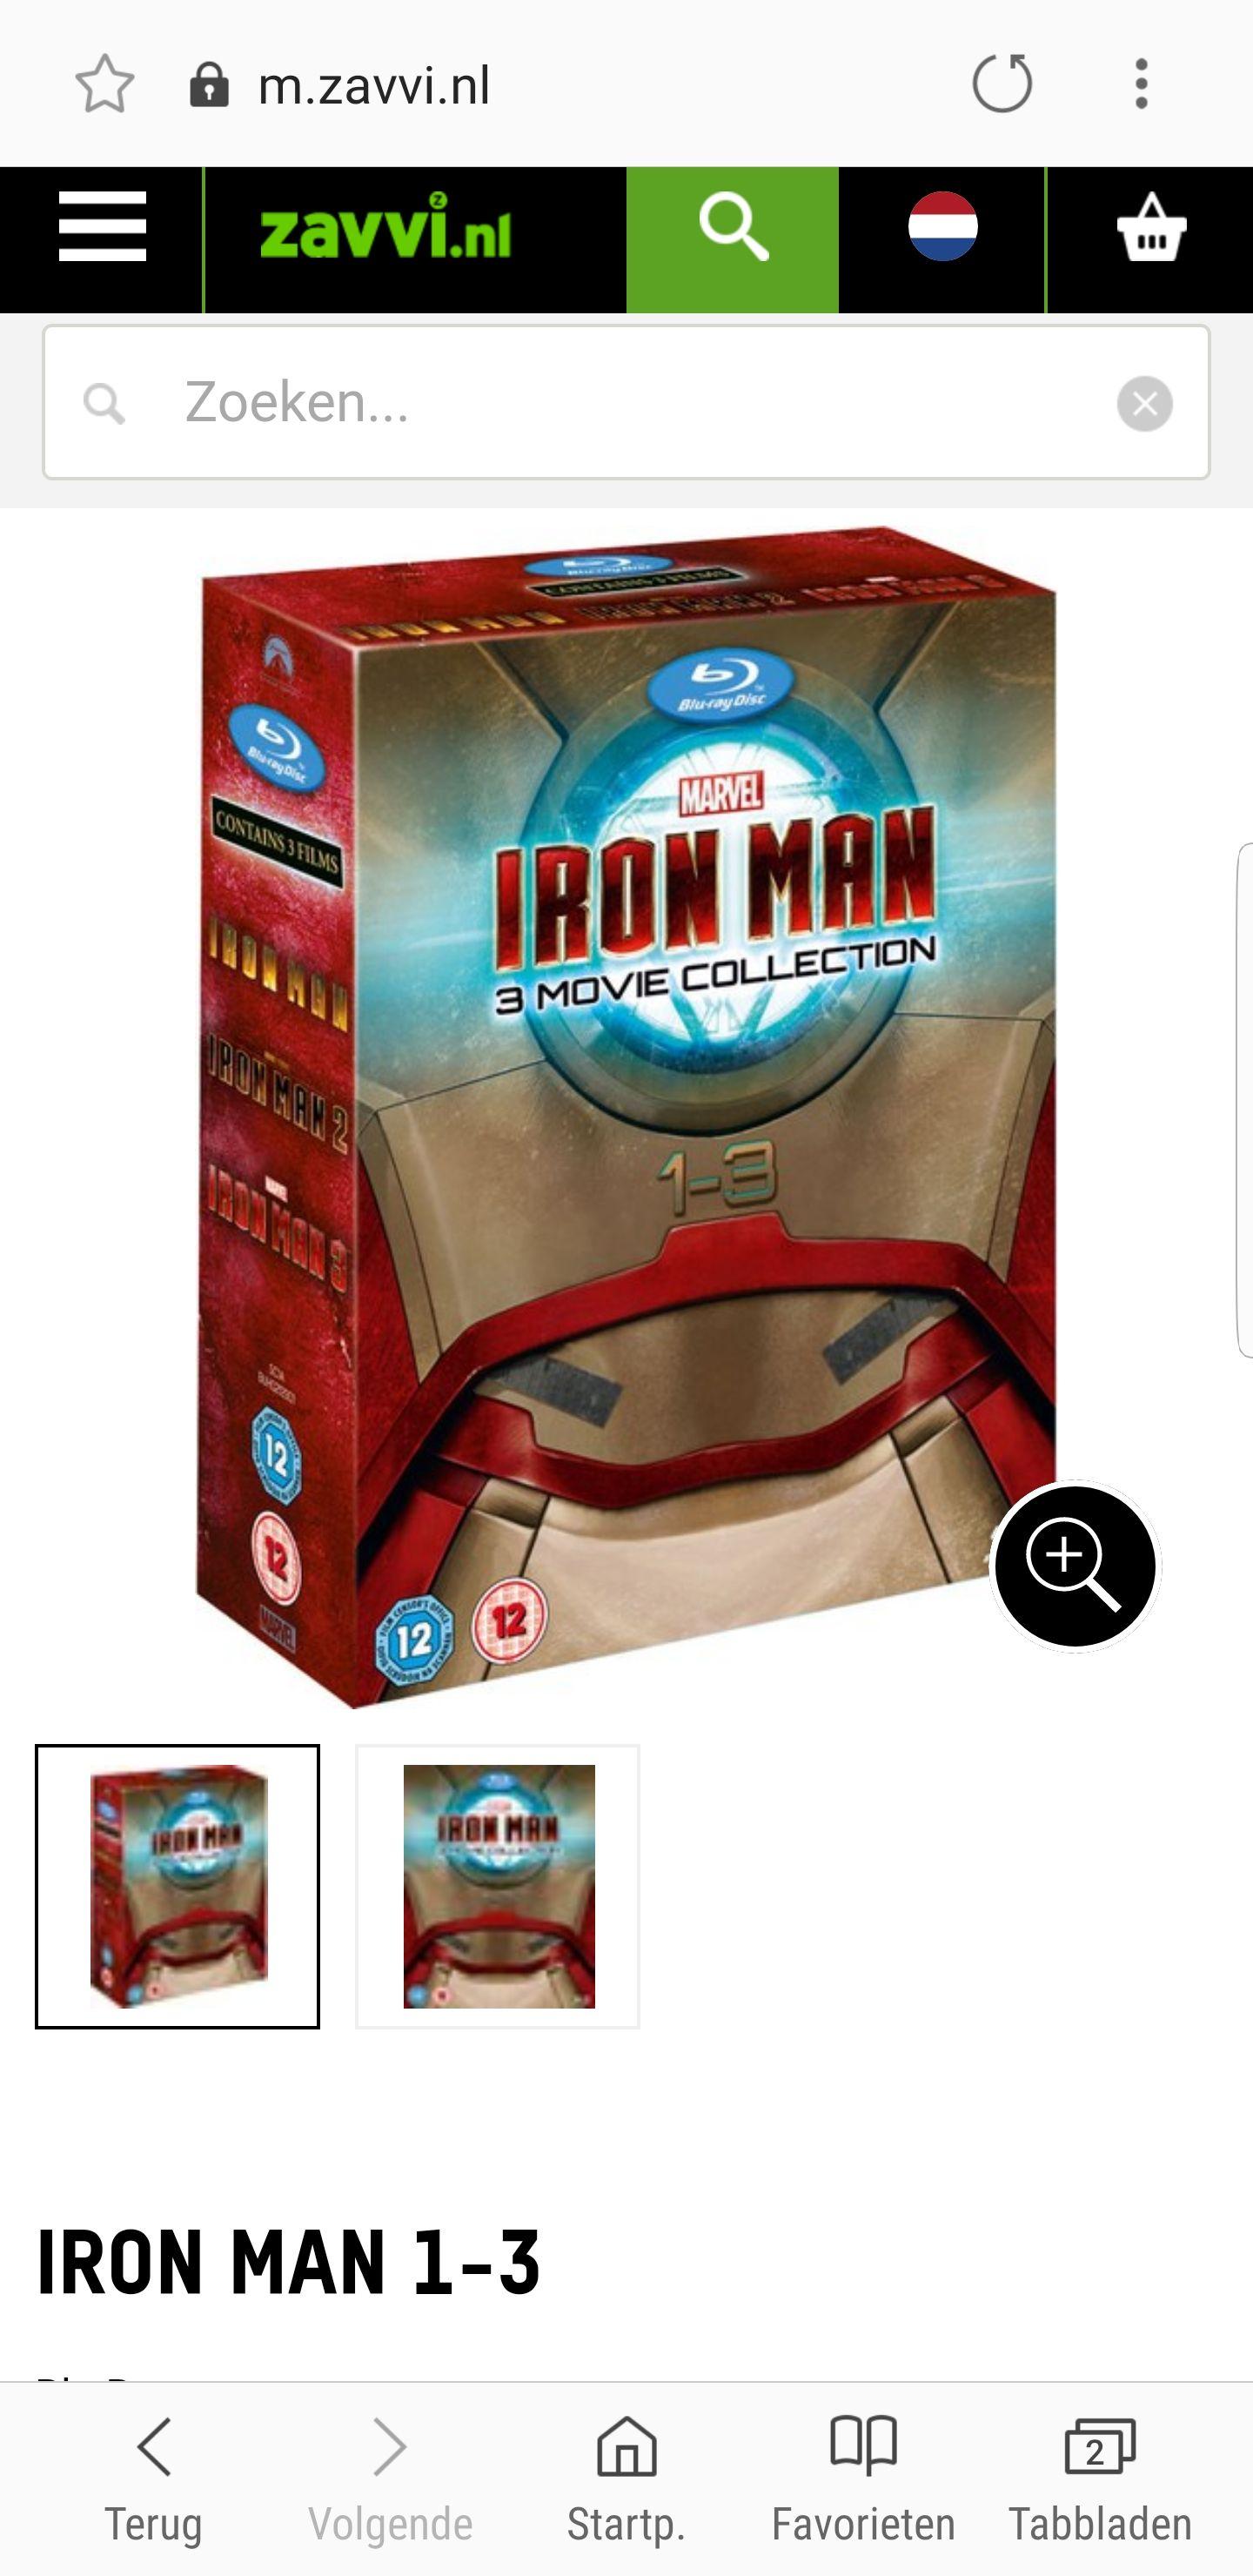 Iron man 3 film Bluray collection